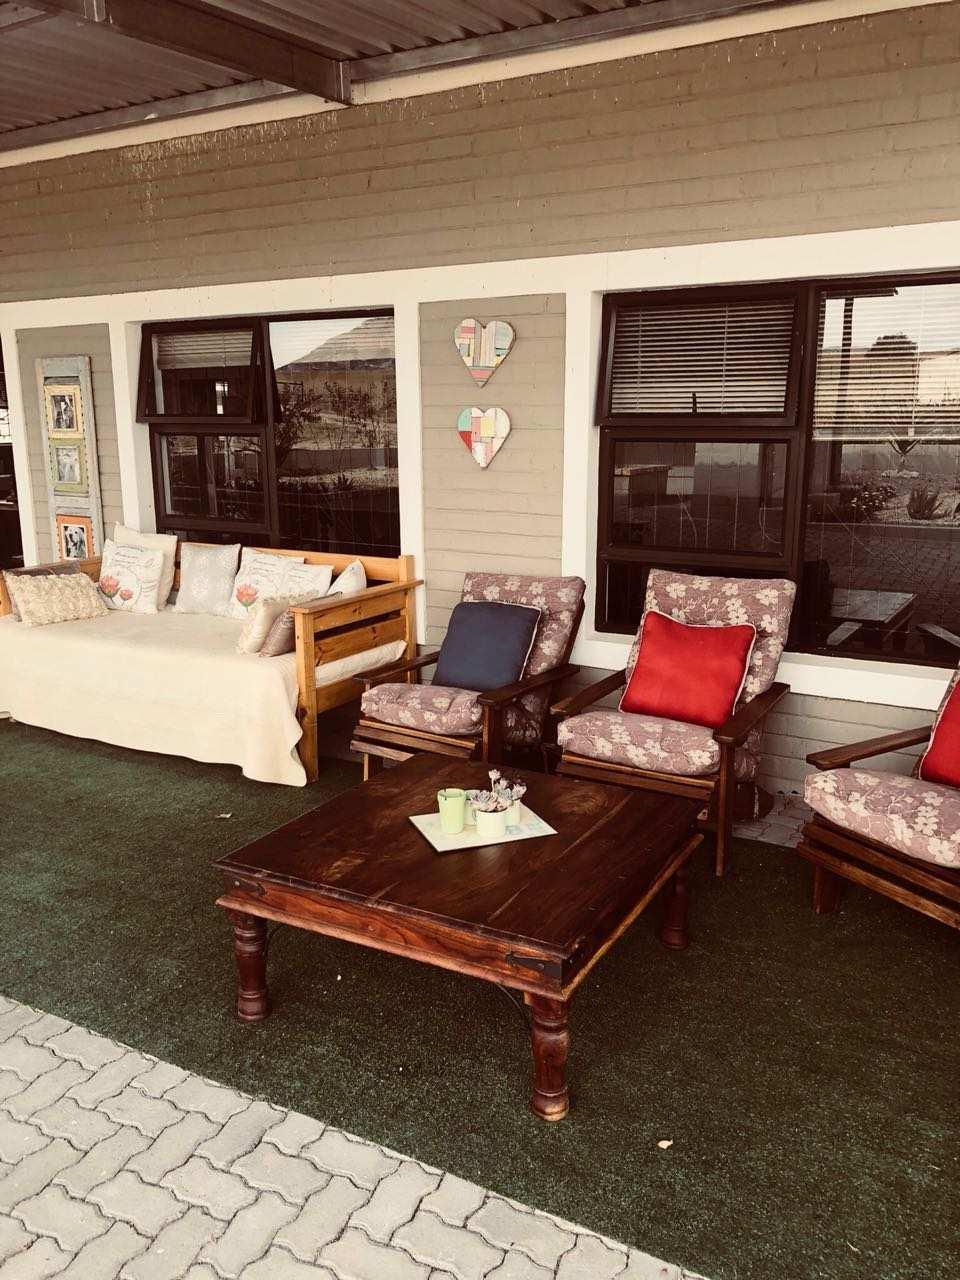 English Sitting Rooms: Liefland Selfsorg Akkomodasie, Springbok